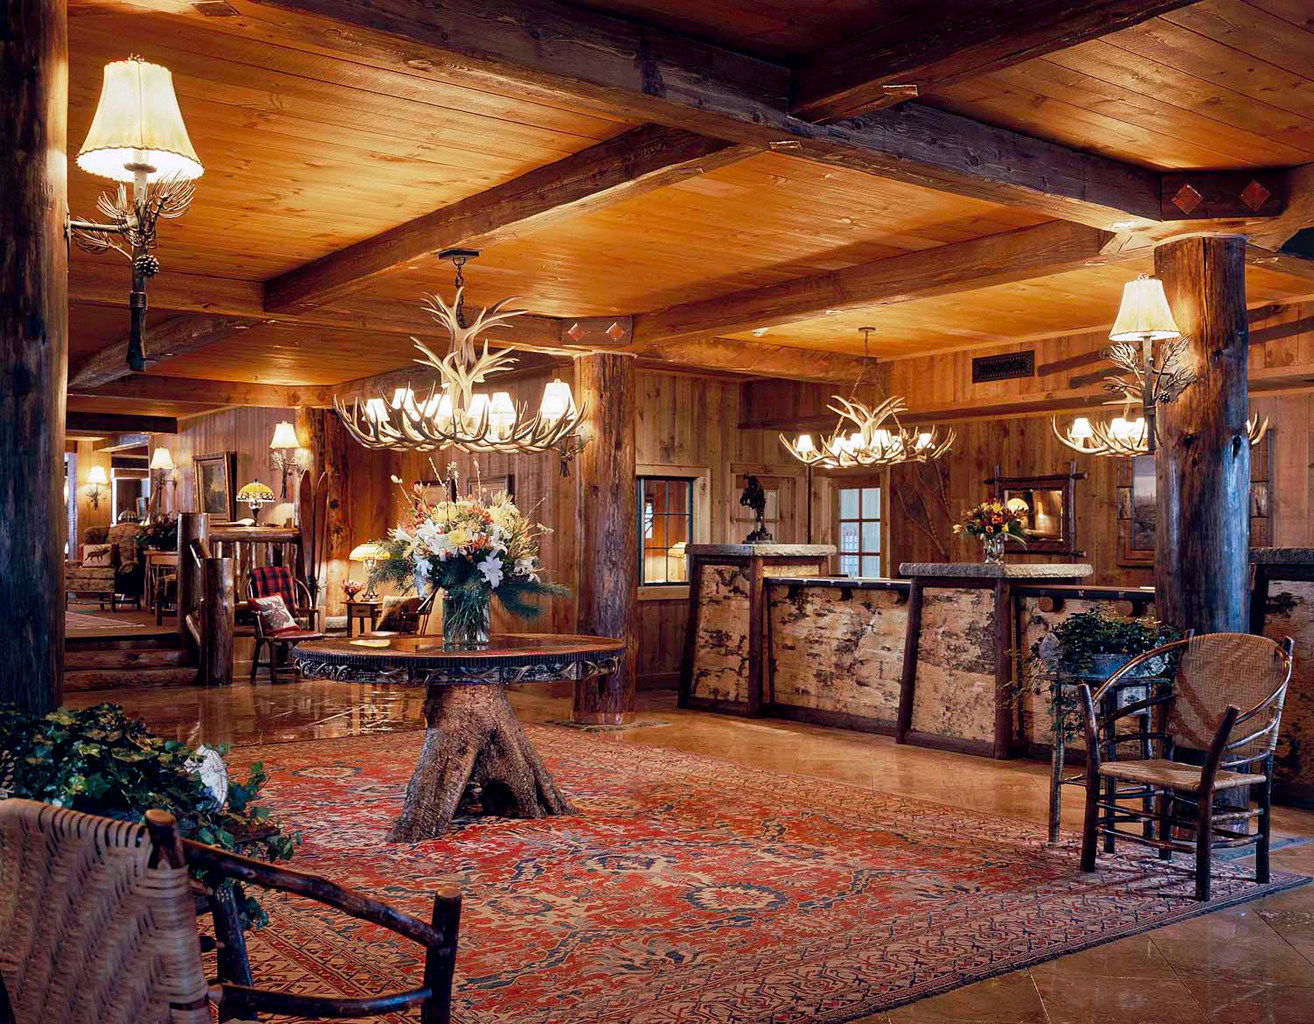 Living Lodge Lounge Luxury Romantic Rustic Trip Ideas ceiling indoor room estate home Lobby log cabin wood interior design restaurant furniture living room area dining room several